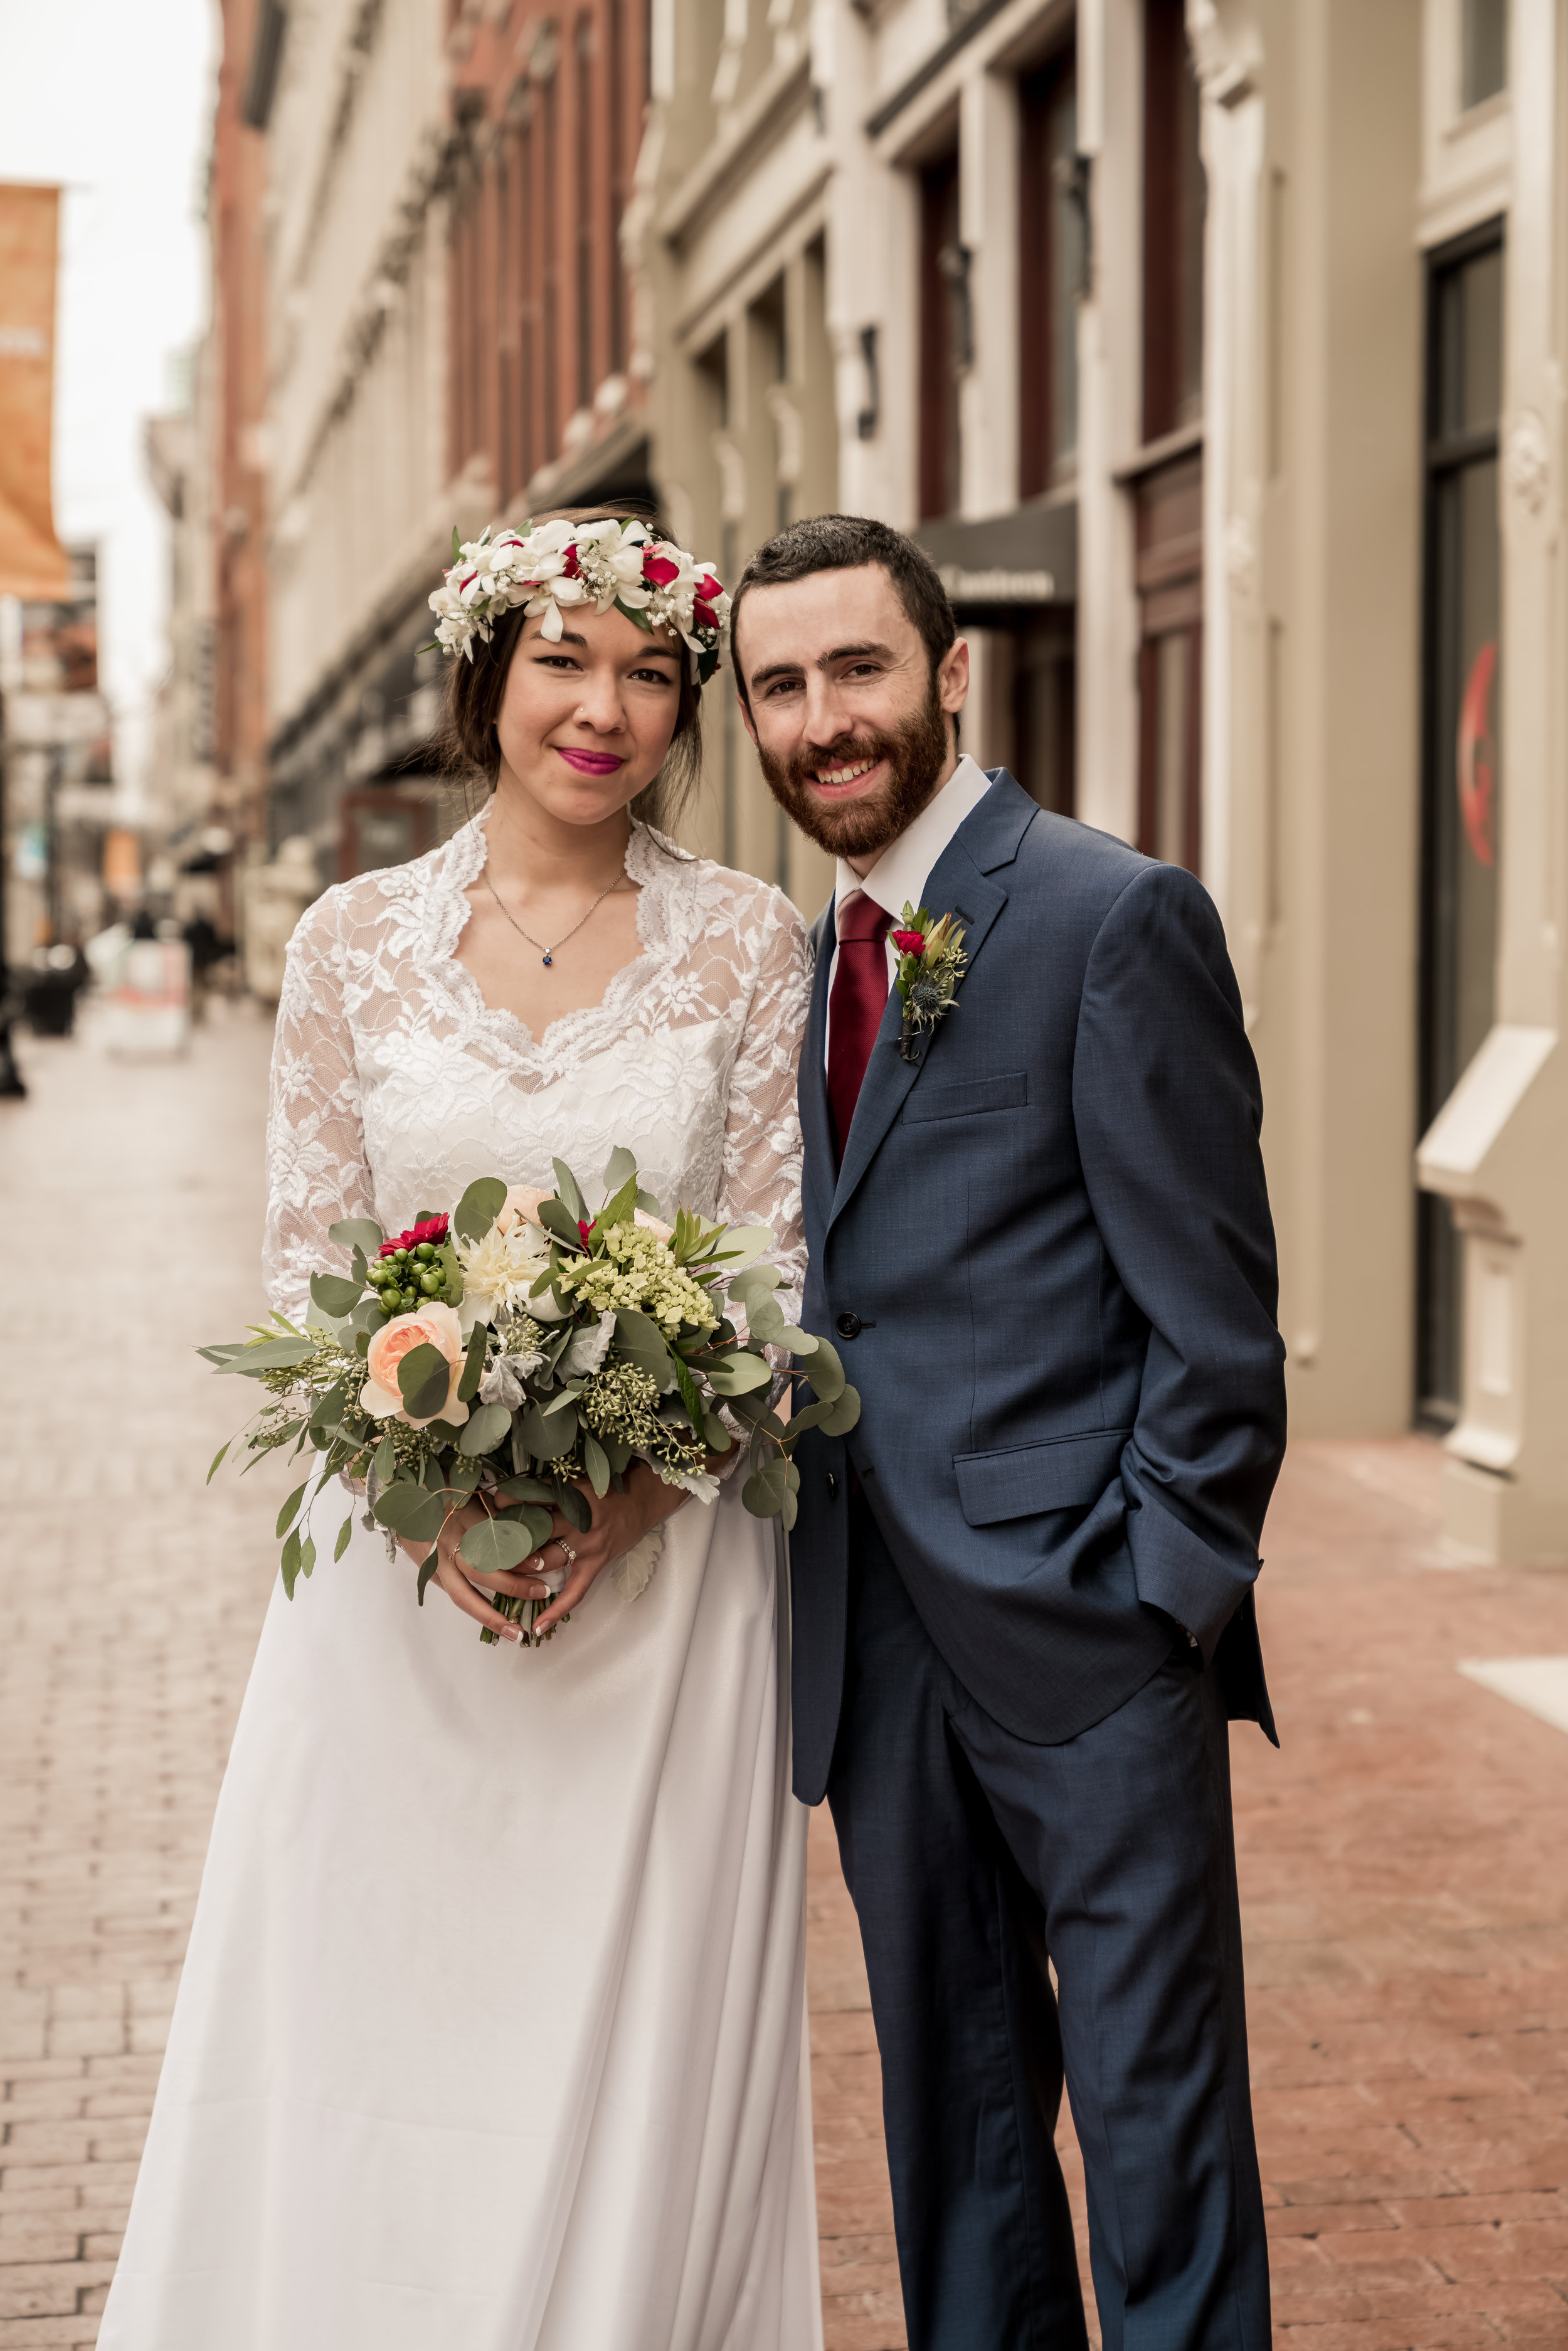 Louisville Downtown Wedding field photo photographer